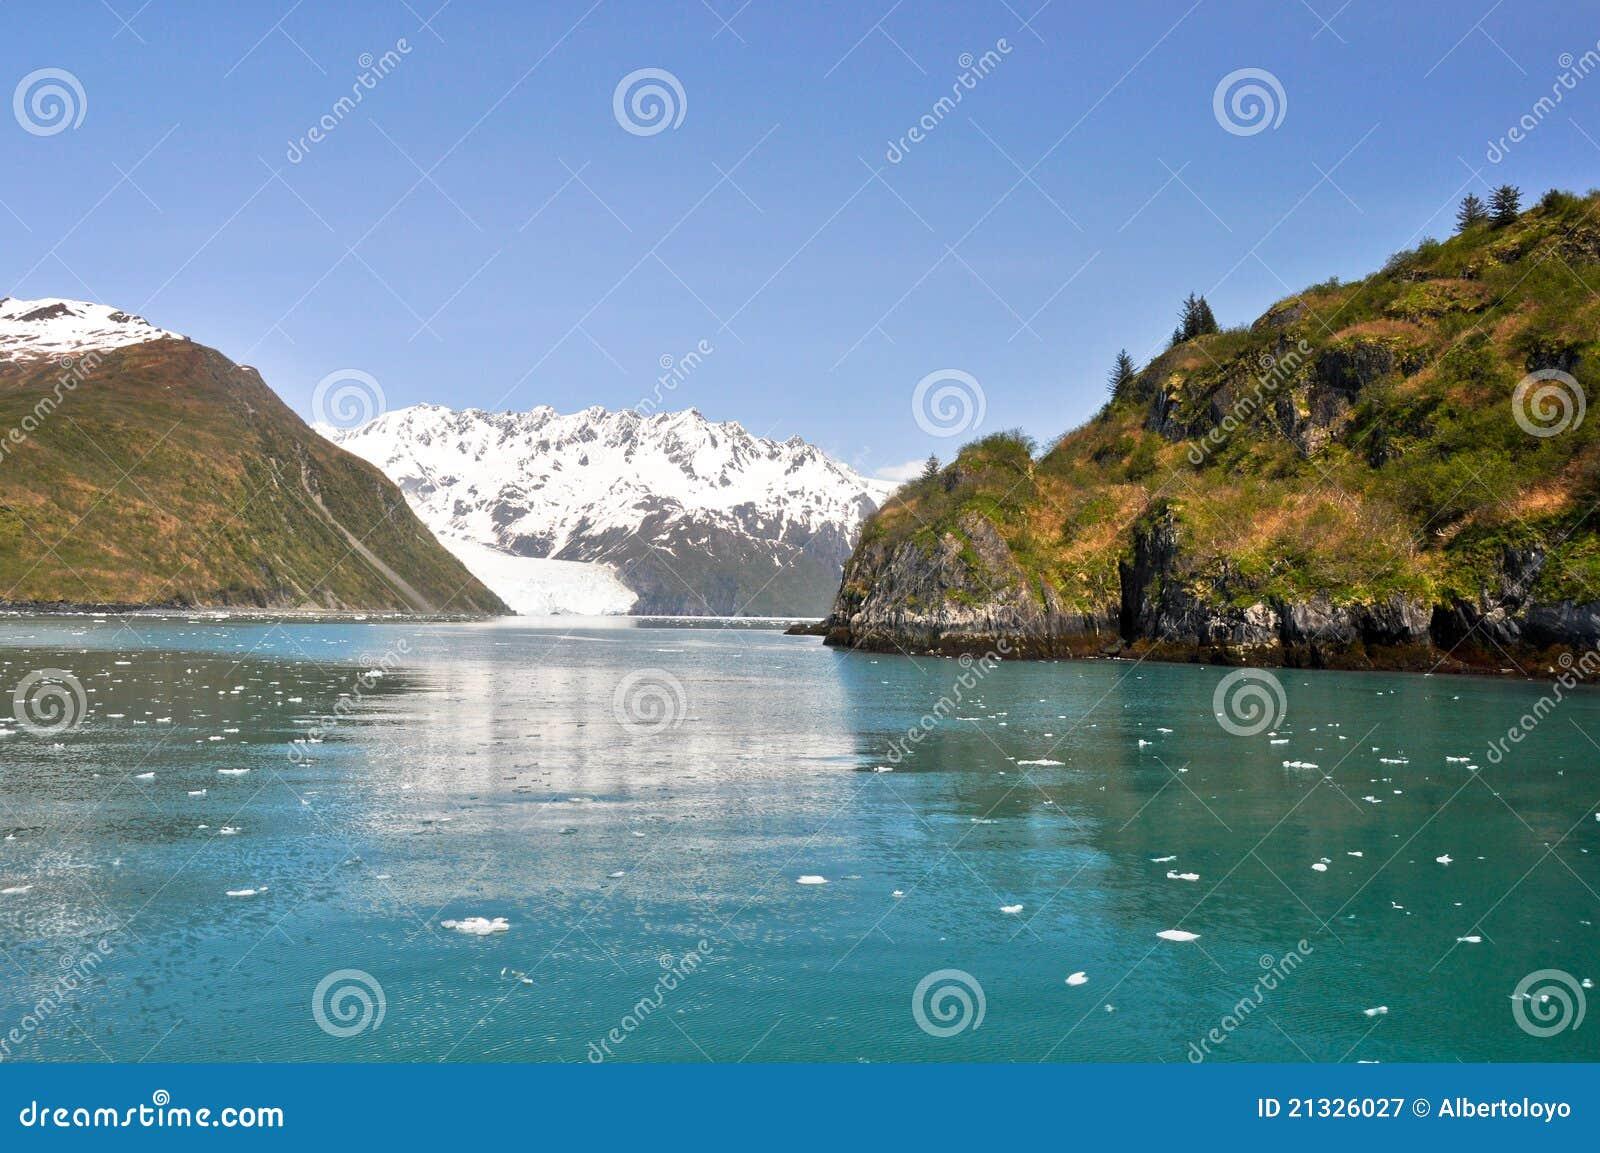 Slate Island Aialik Bay Kenai Fjords Np Alaska Royalty